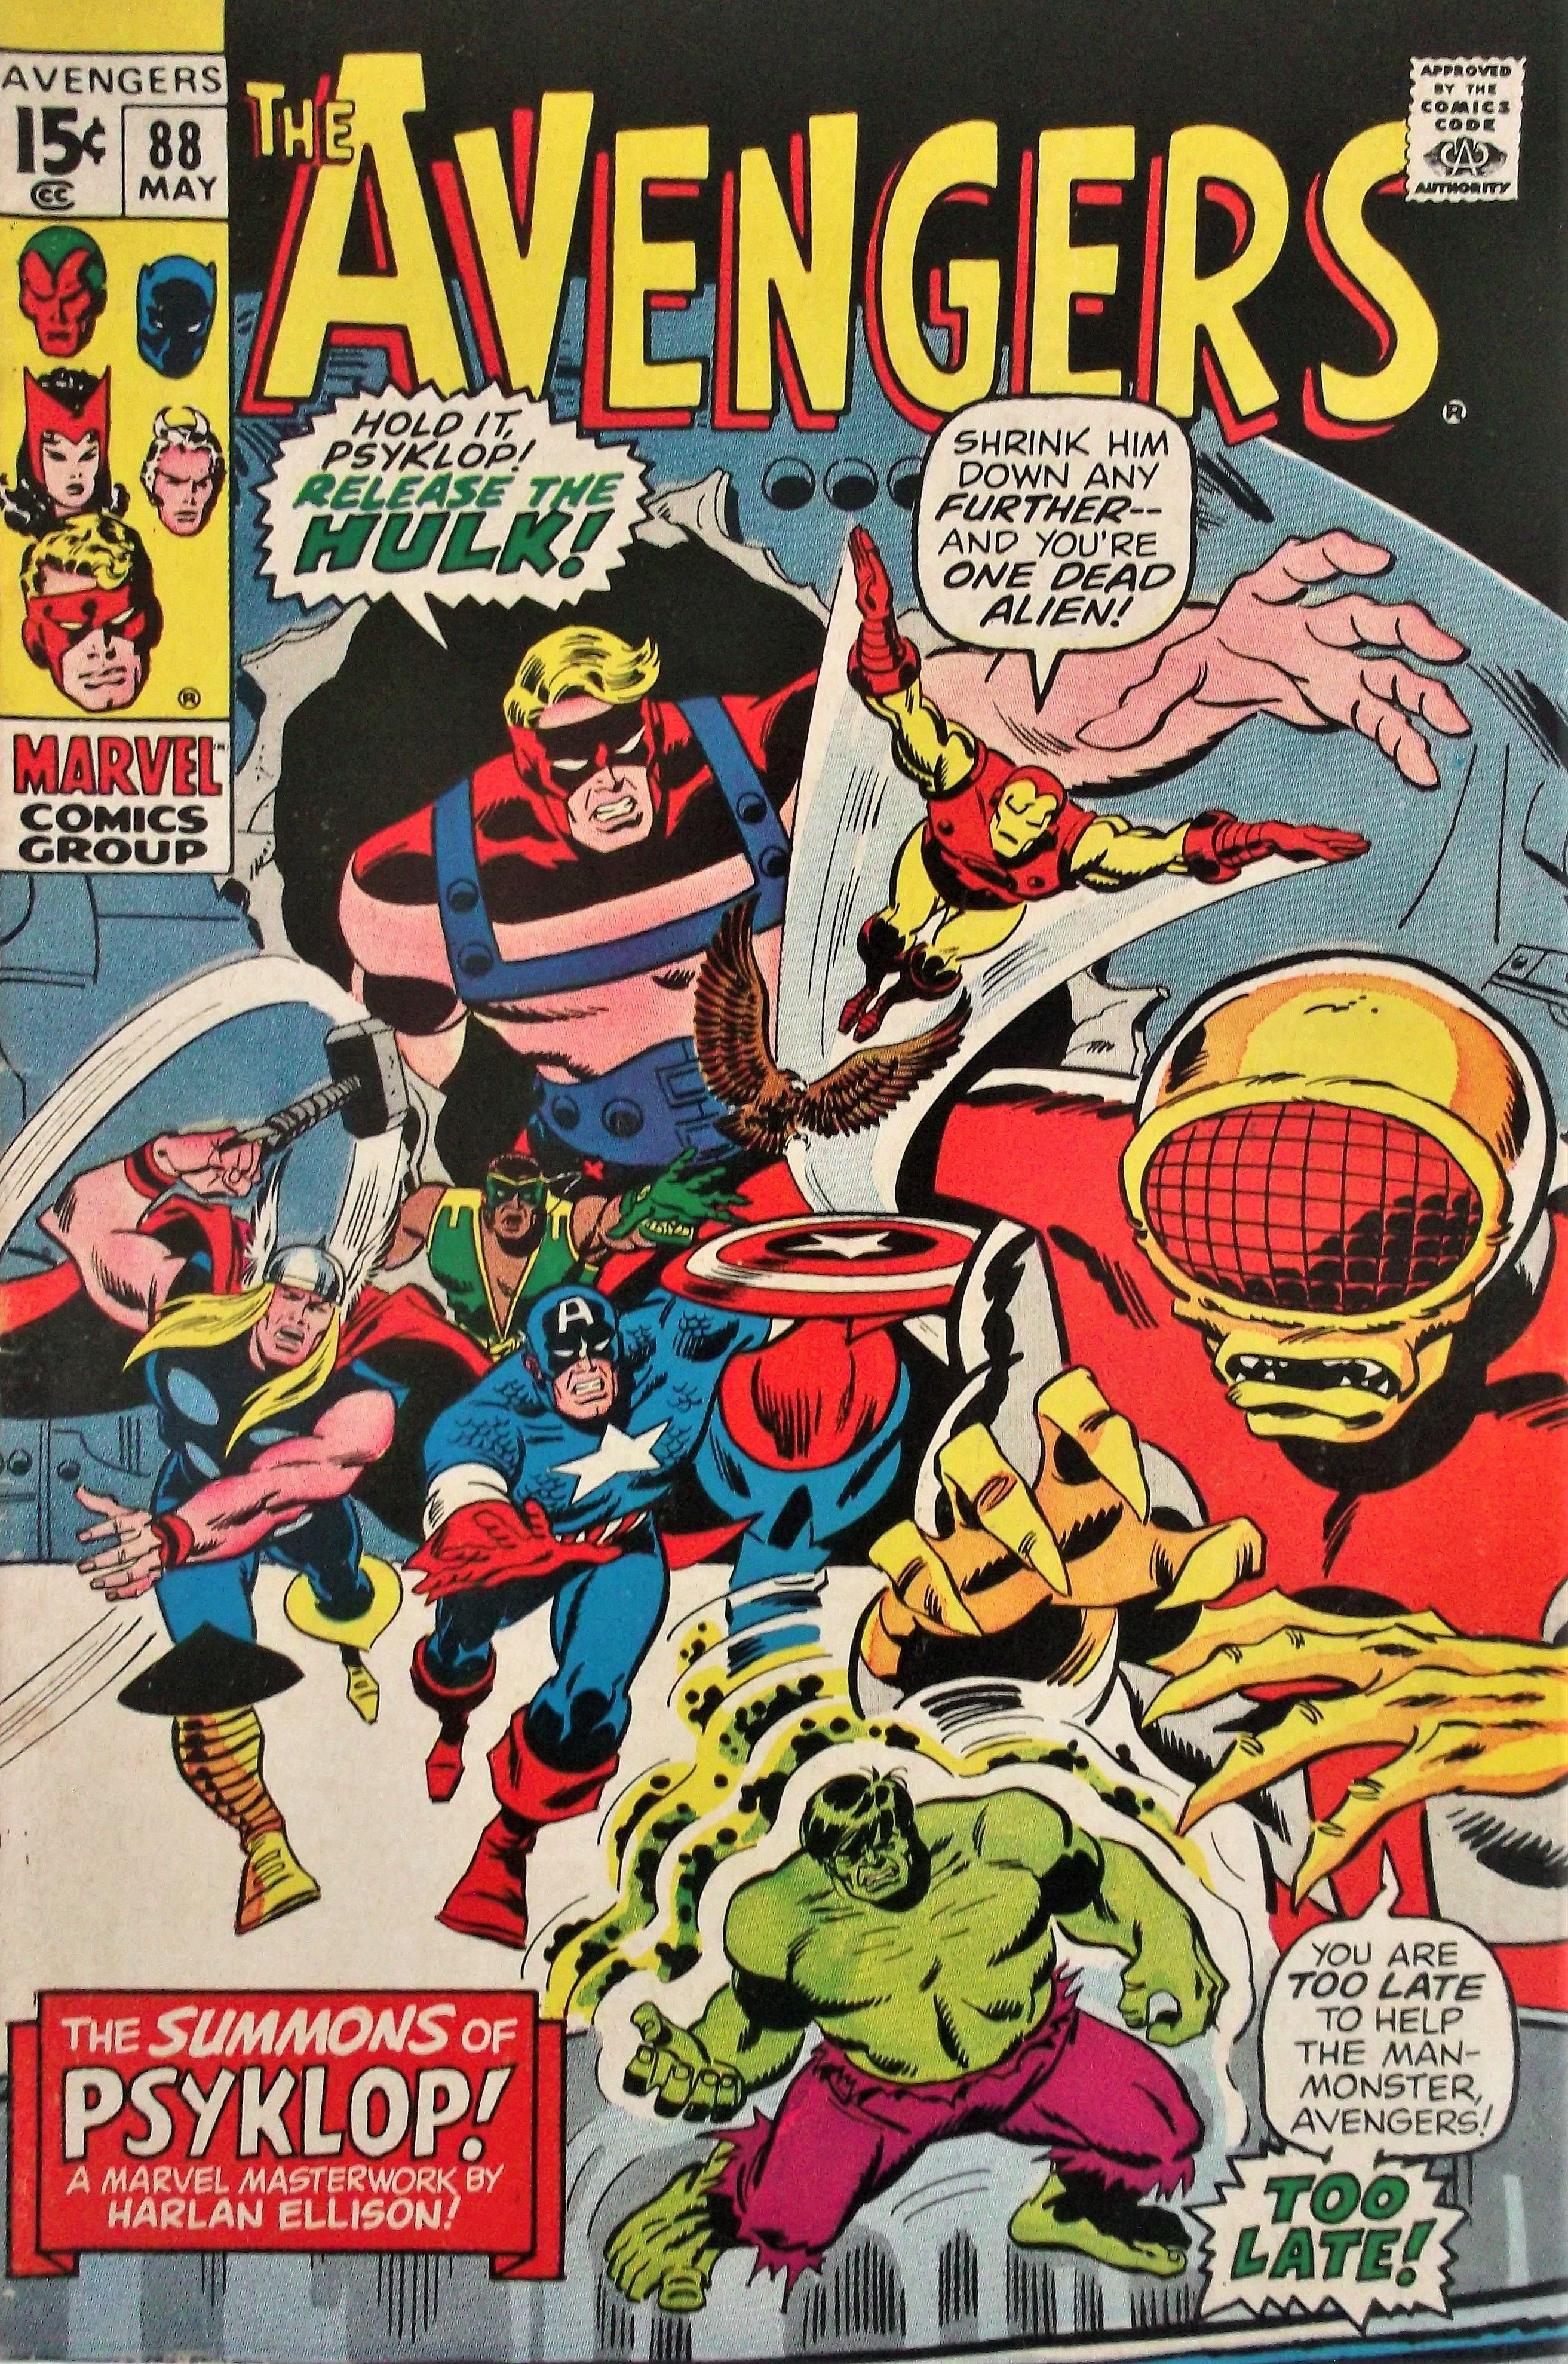 The Avengers 88